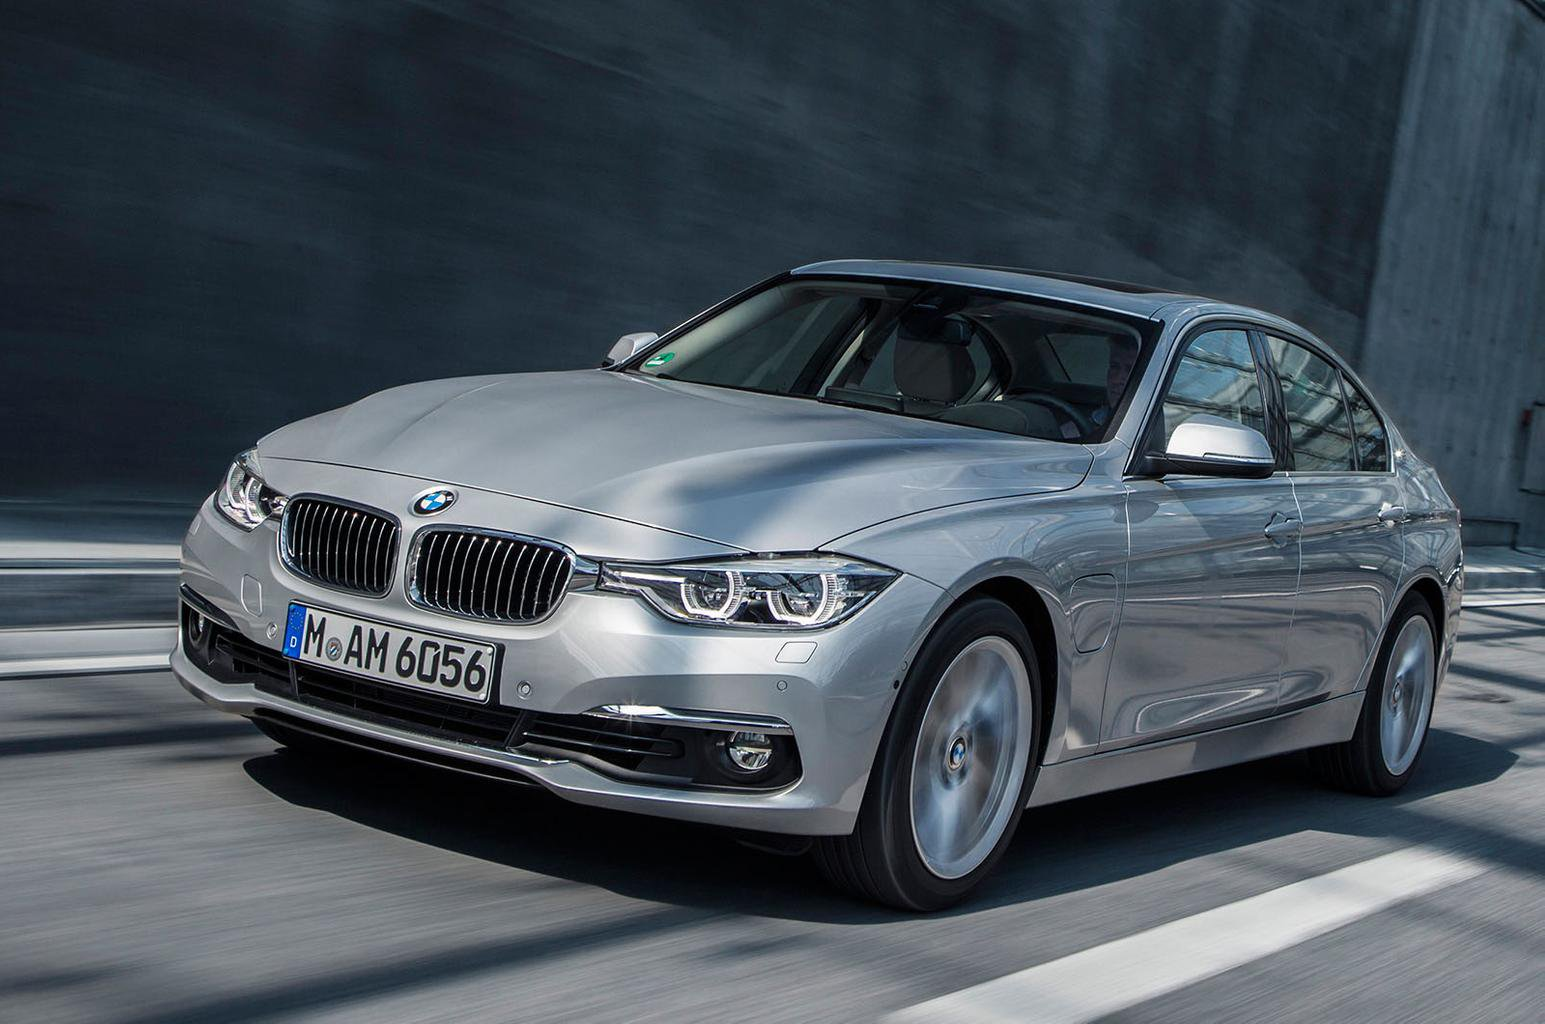 BMW introduce three new hybrid models at the Frankfurt motor show